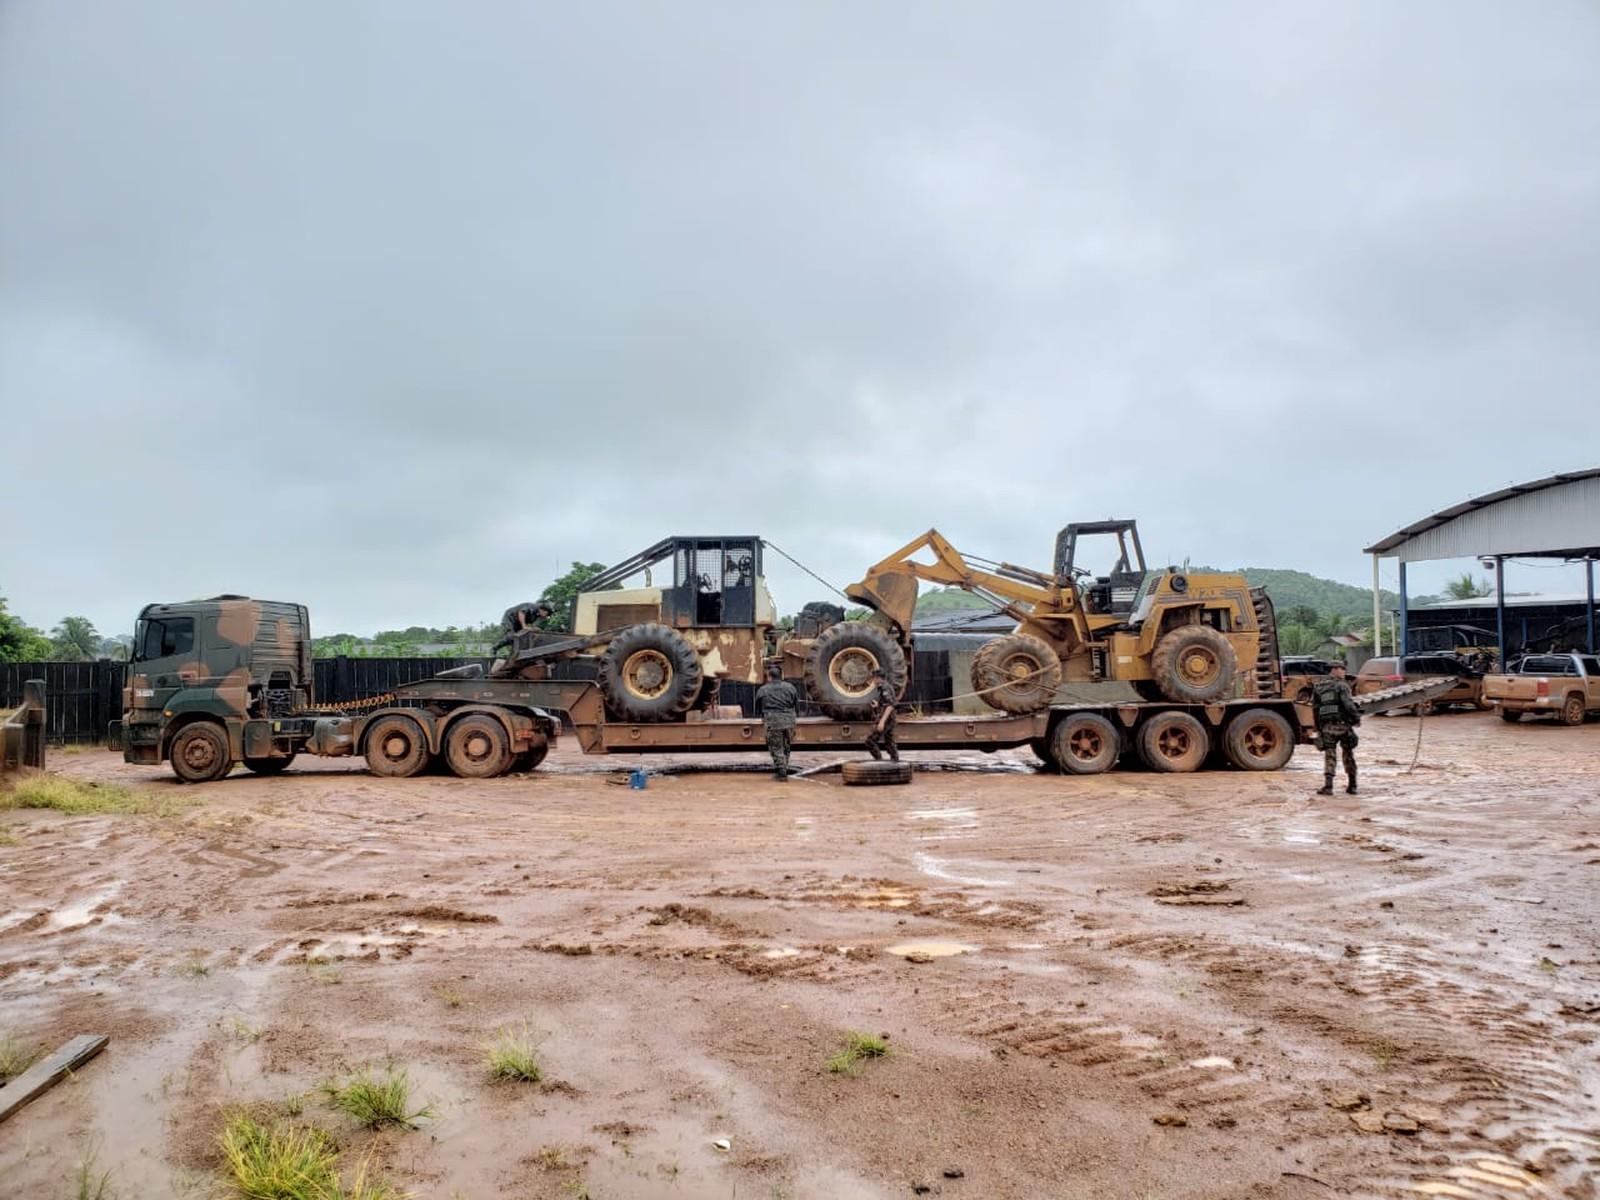 Logging machinery seized near Karipuna Indigenous Land in Brazil